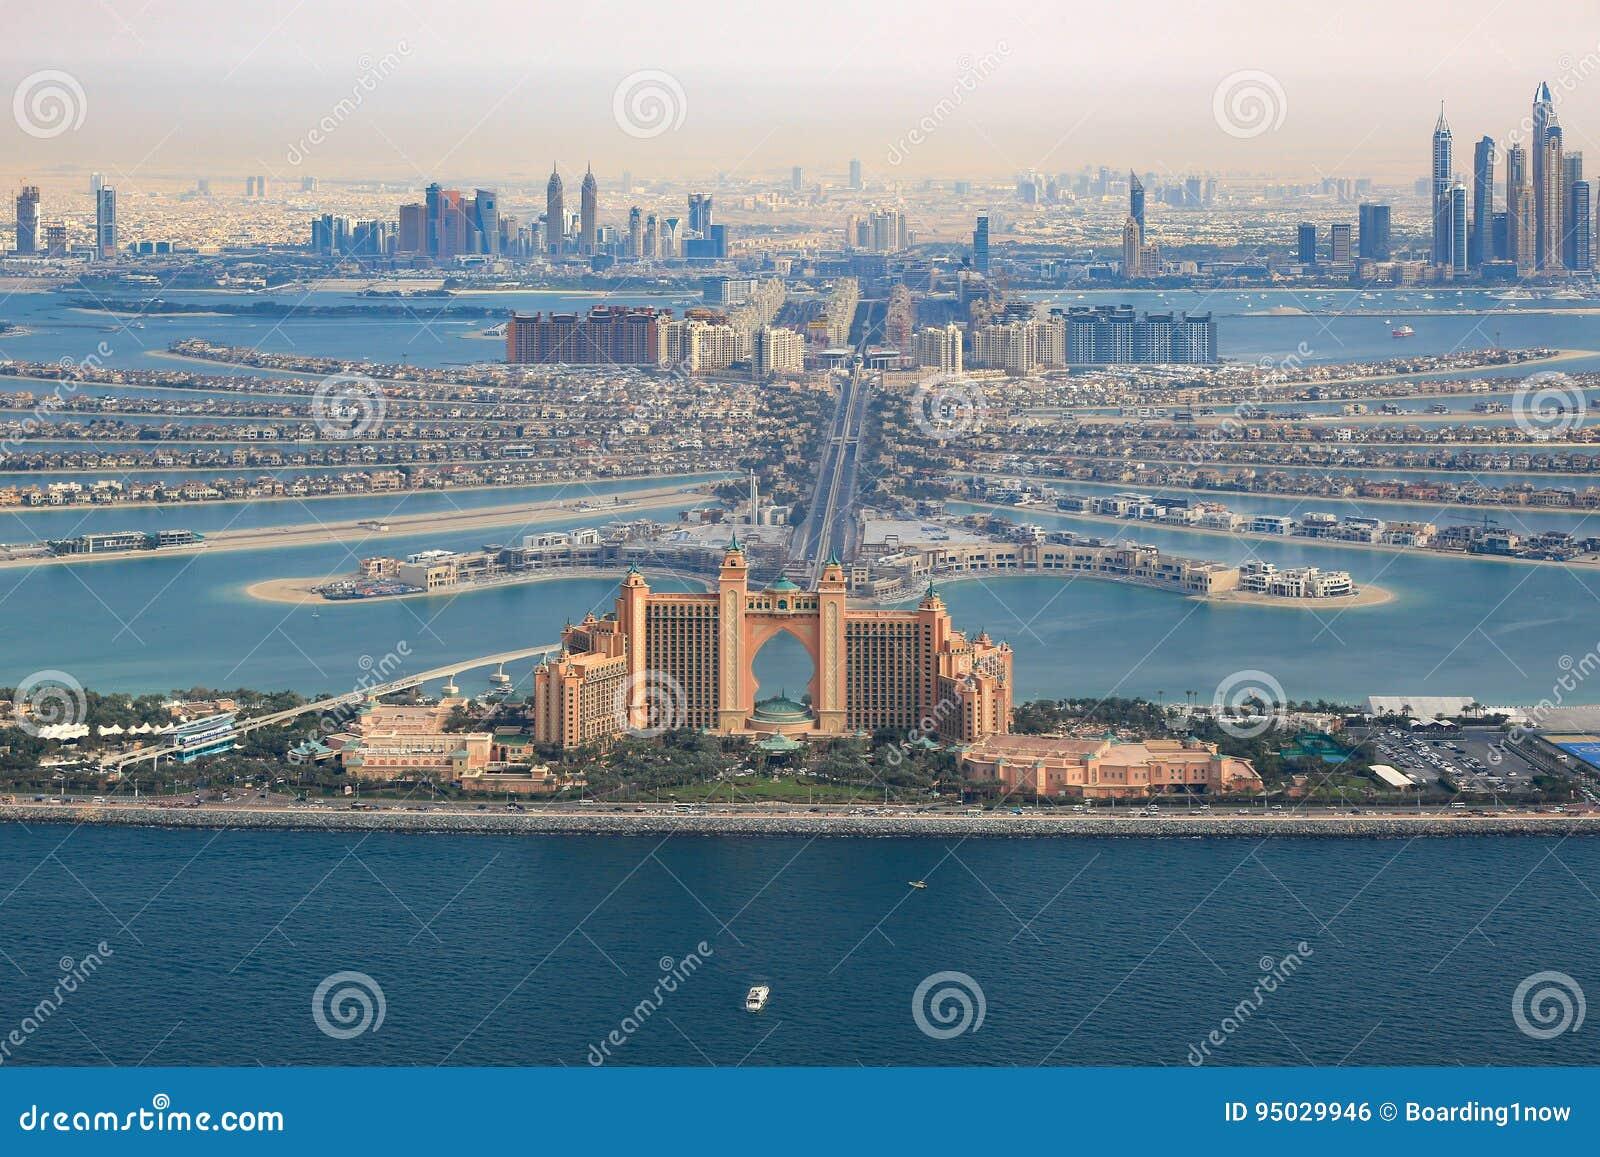 Dubai flyg hotell